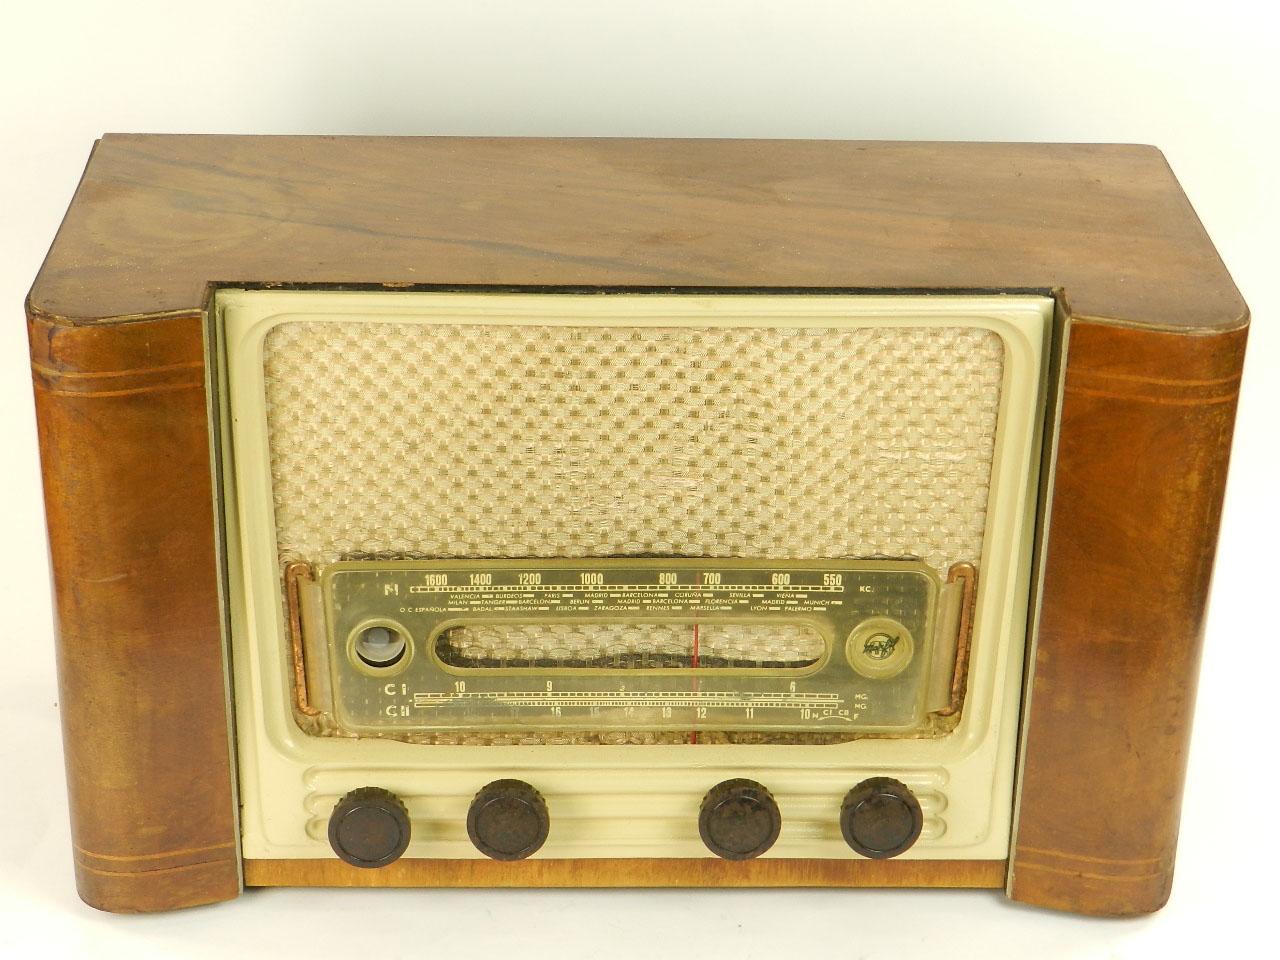 Imagen RADIO MARFIL AN-355 O.M  AÑO 1950 25918